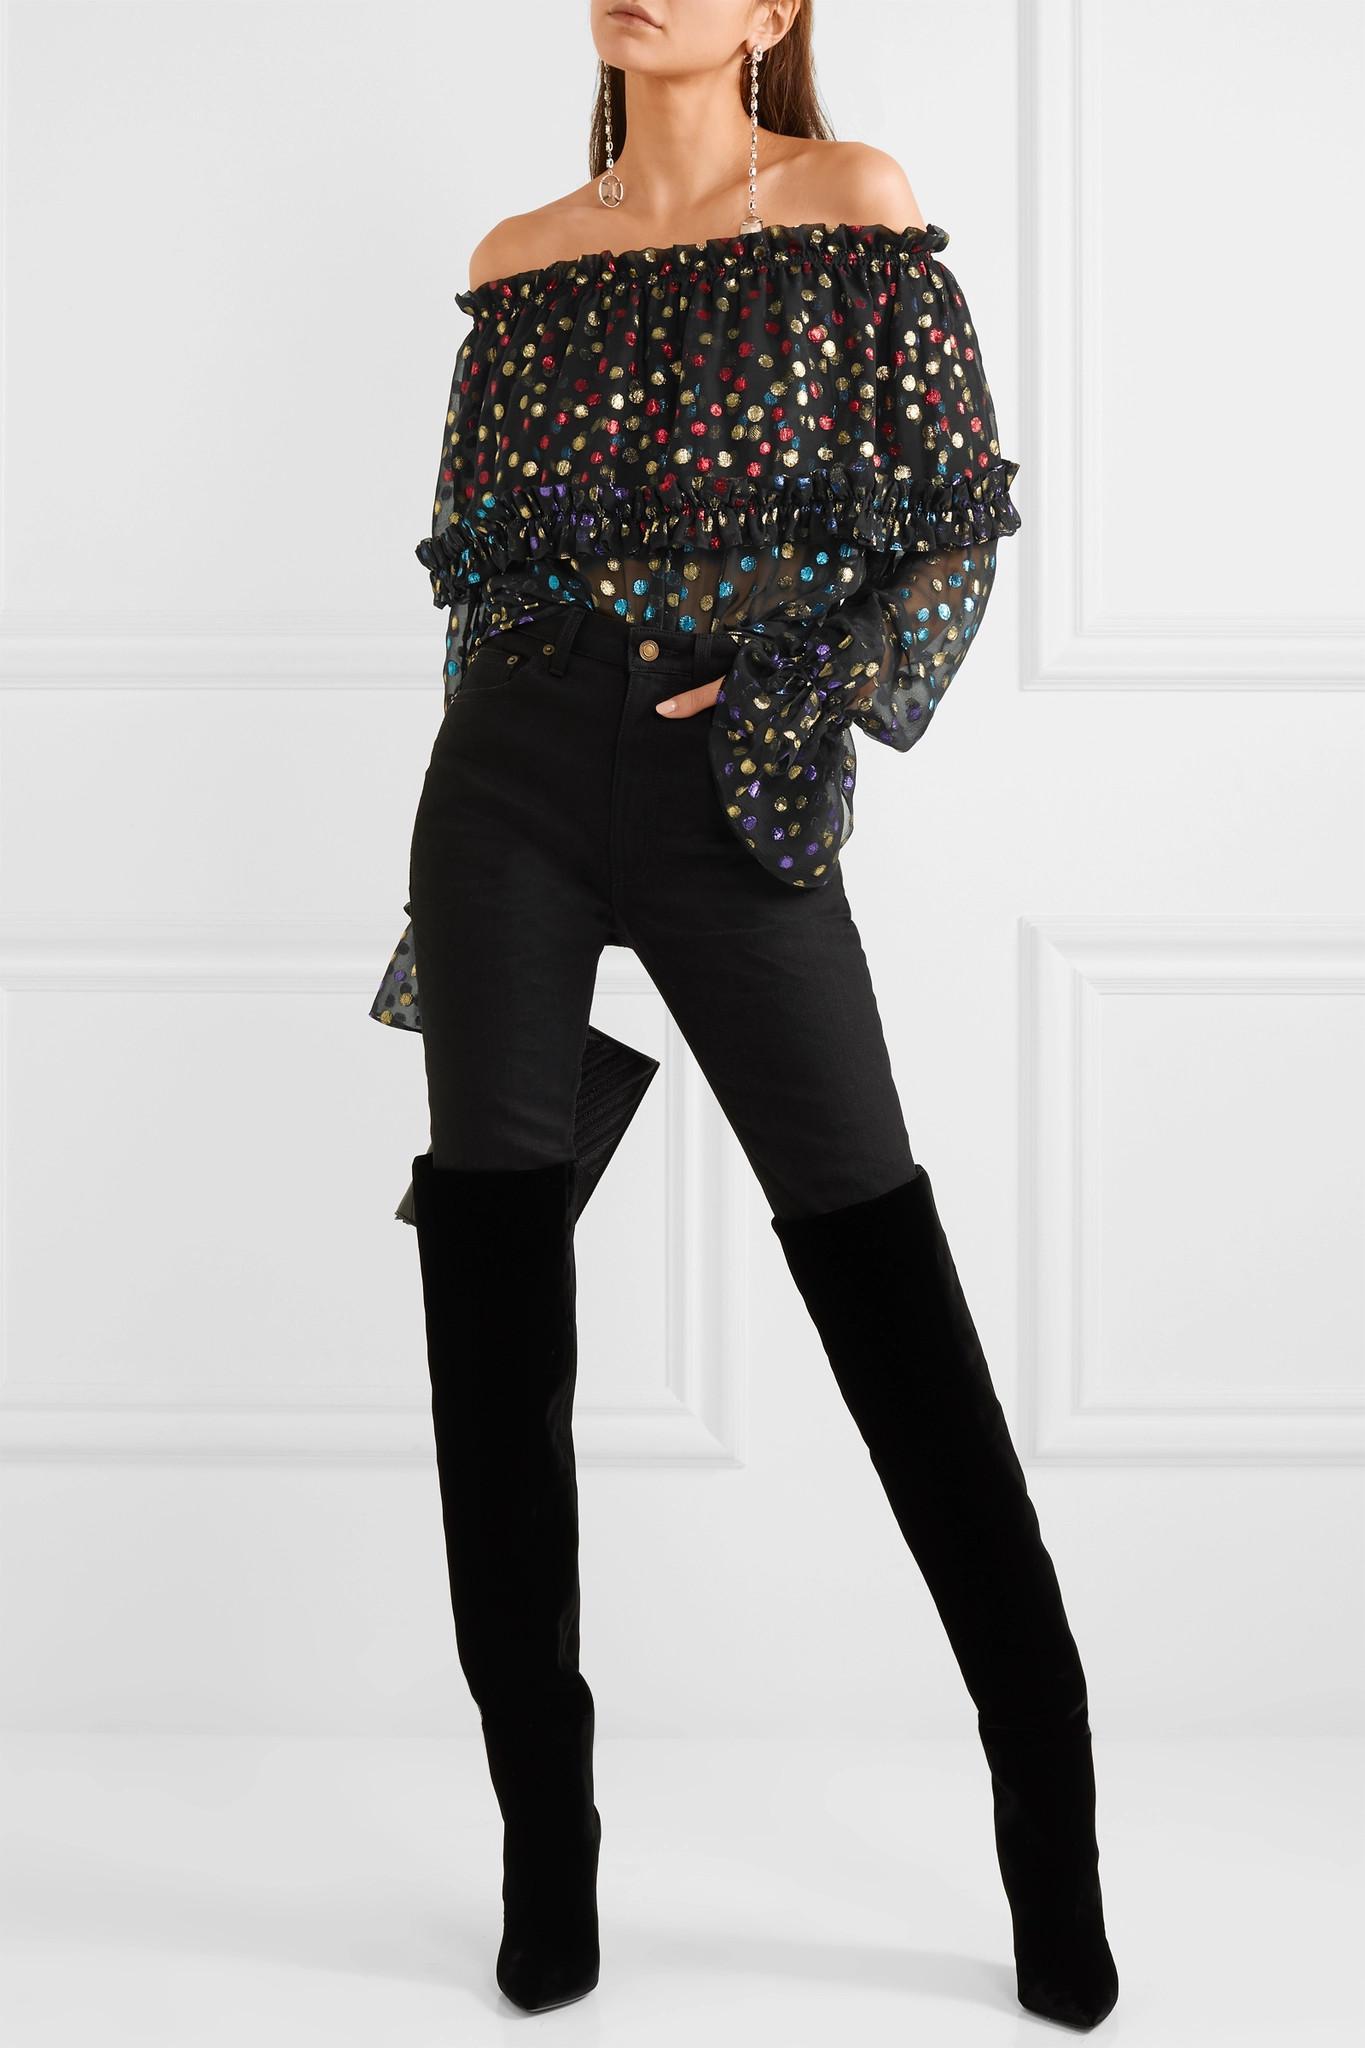 With Mastercard Online Outlet Fake fil coupé off the shoulder blouse - Black Saint Laurent GROQJpP